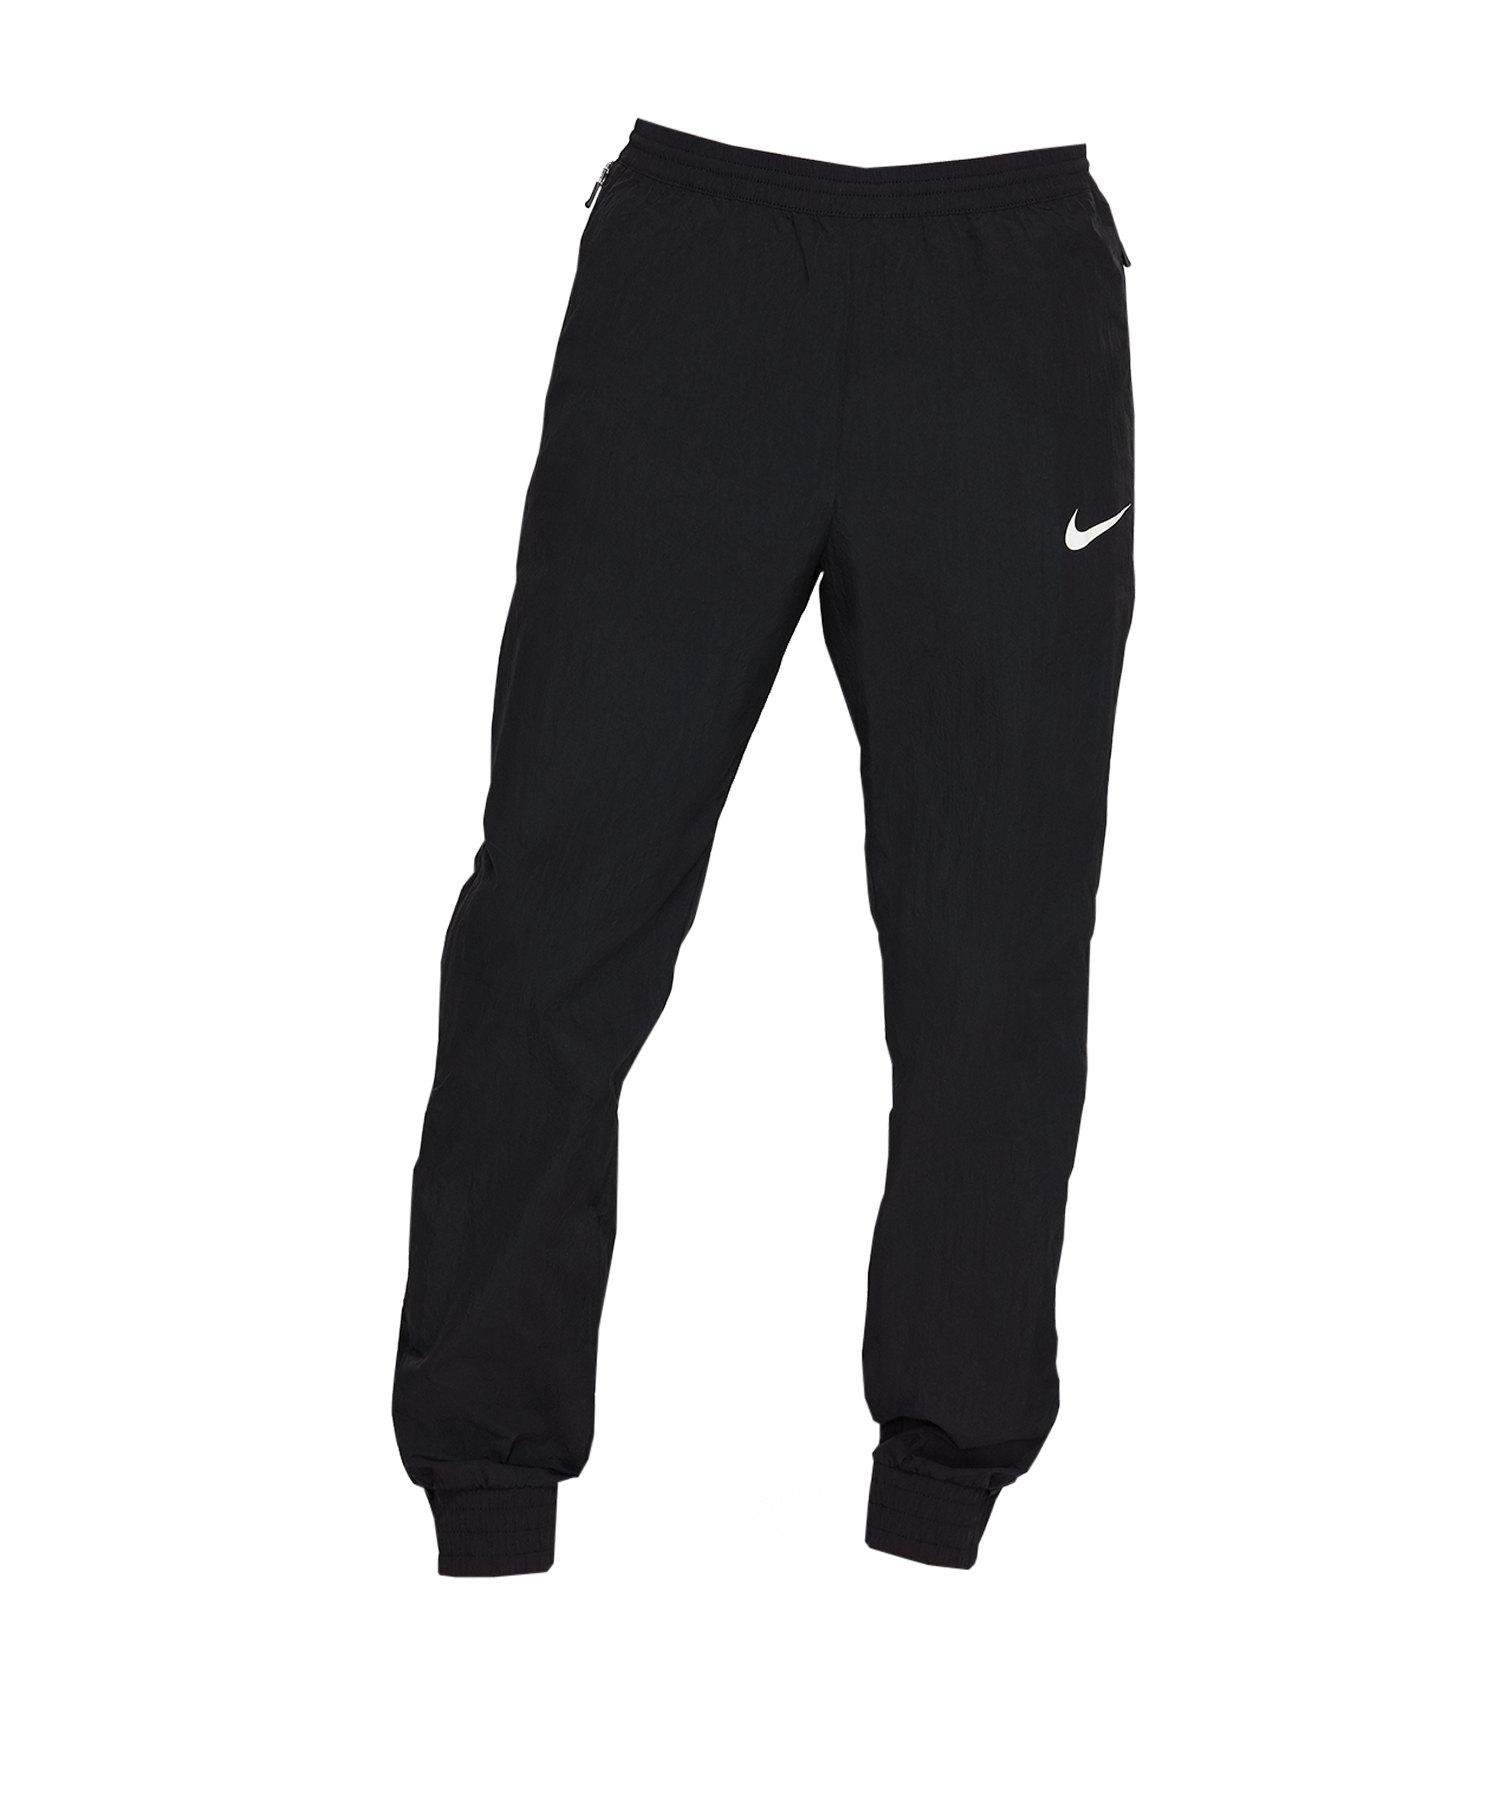 Nike F.C. Pant Woven Hose Schwarz F010 - schwarz